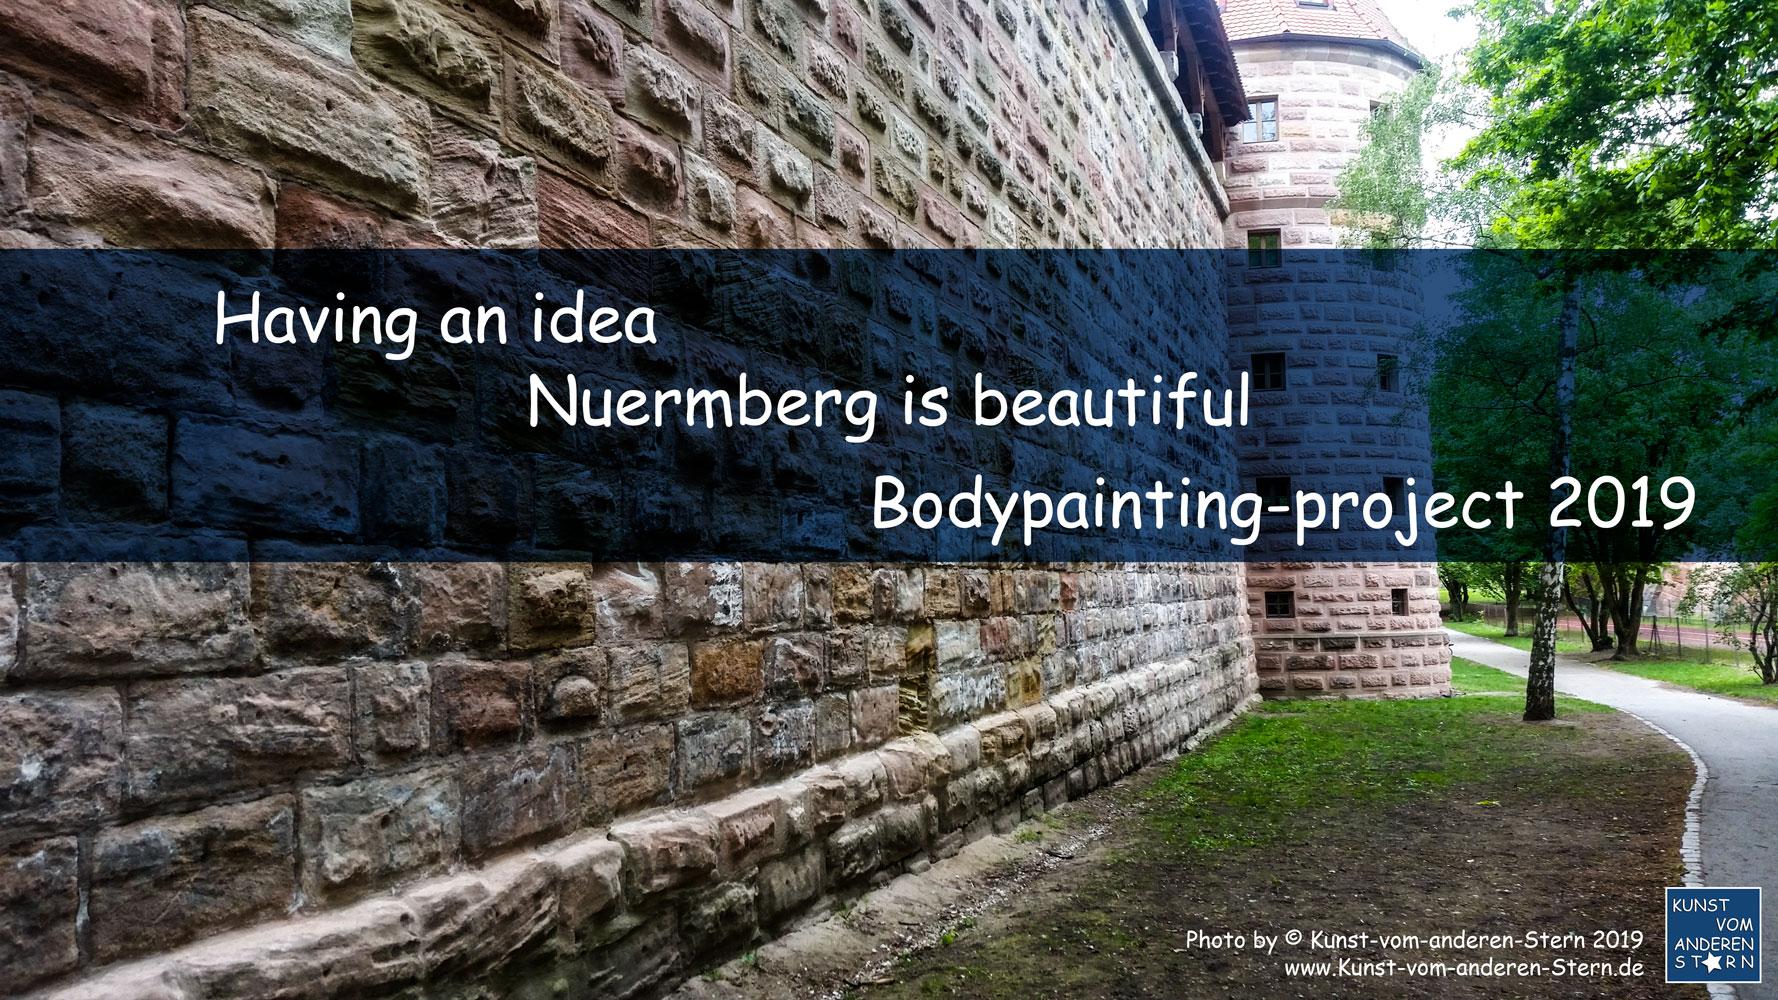 Stadtchamäleons – Bodypainting-Projekt Nürnberg 2019 – Die Idee dahinter